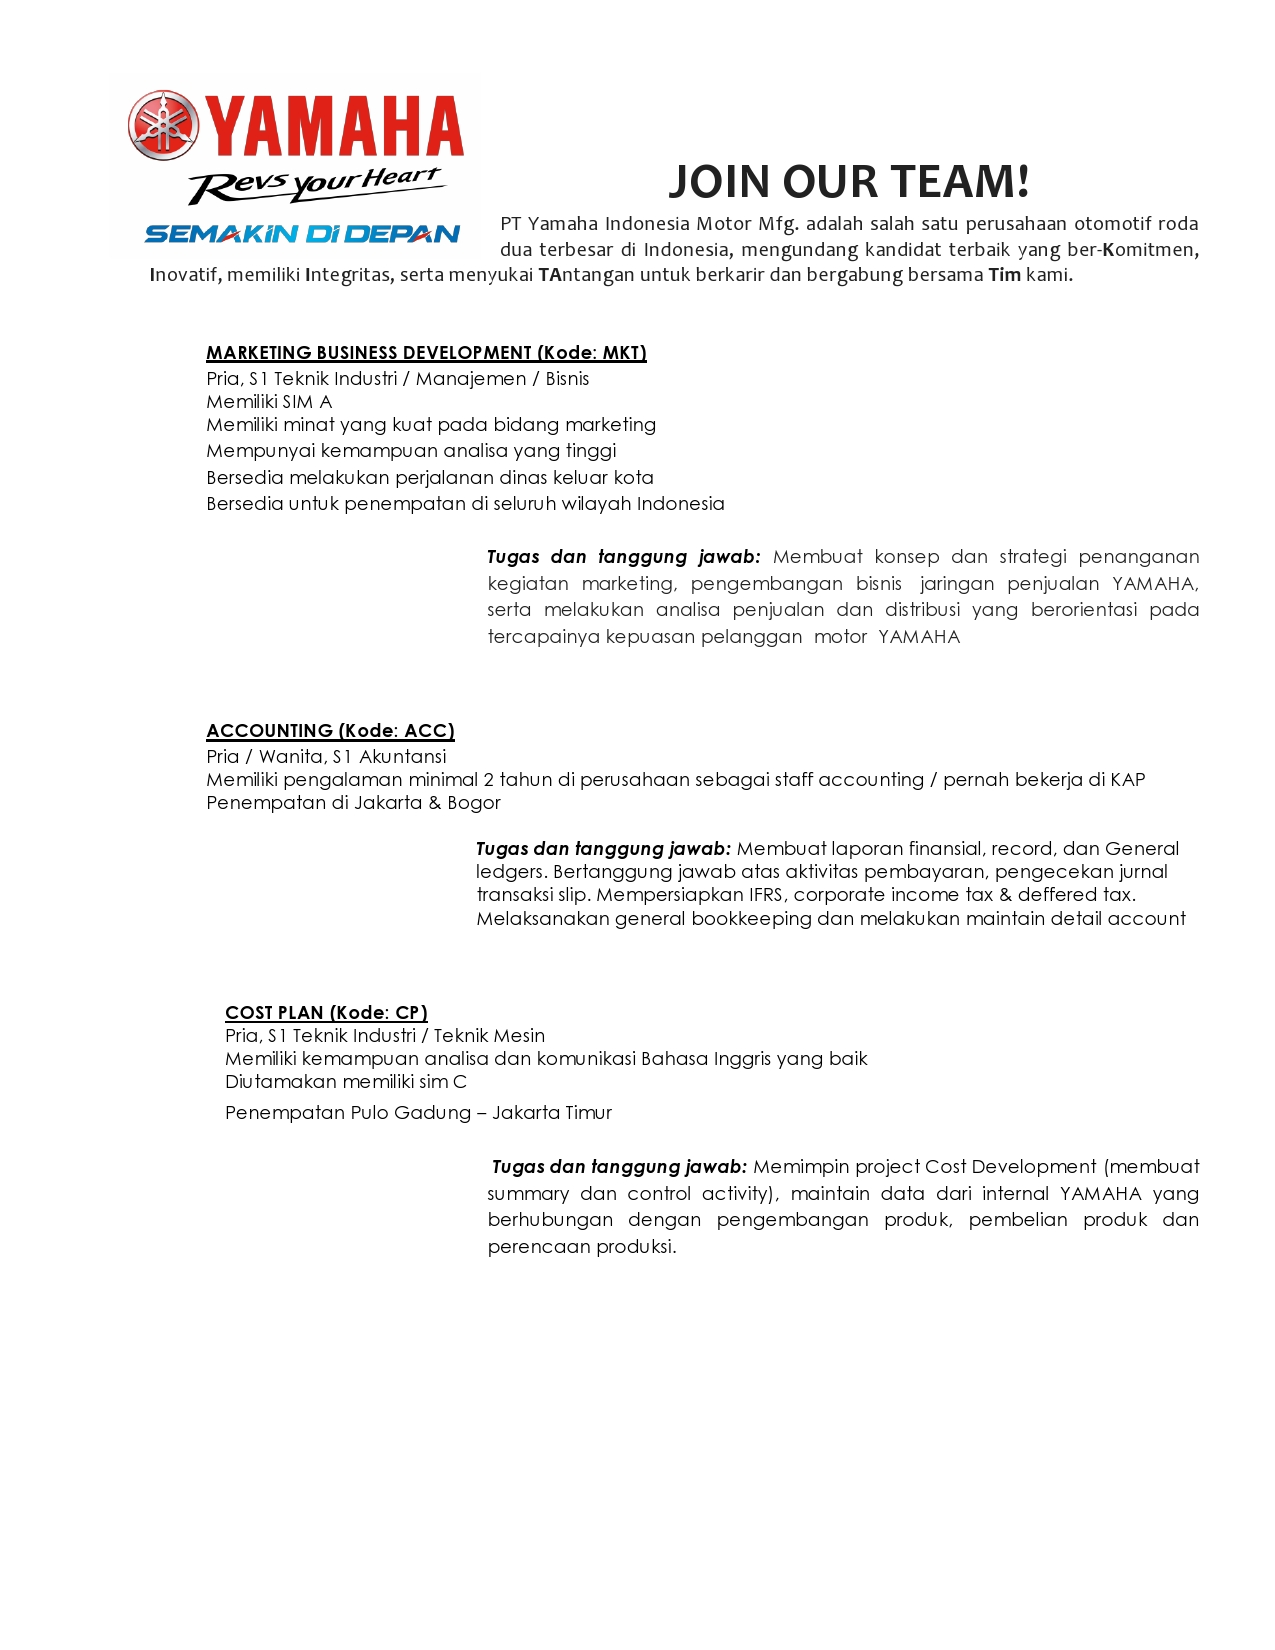 Pt Yamaha Indonesia Motor Mfg Kantor Kemahasiswaan Alumni Dan Campus Ministry